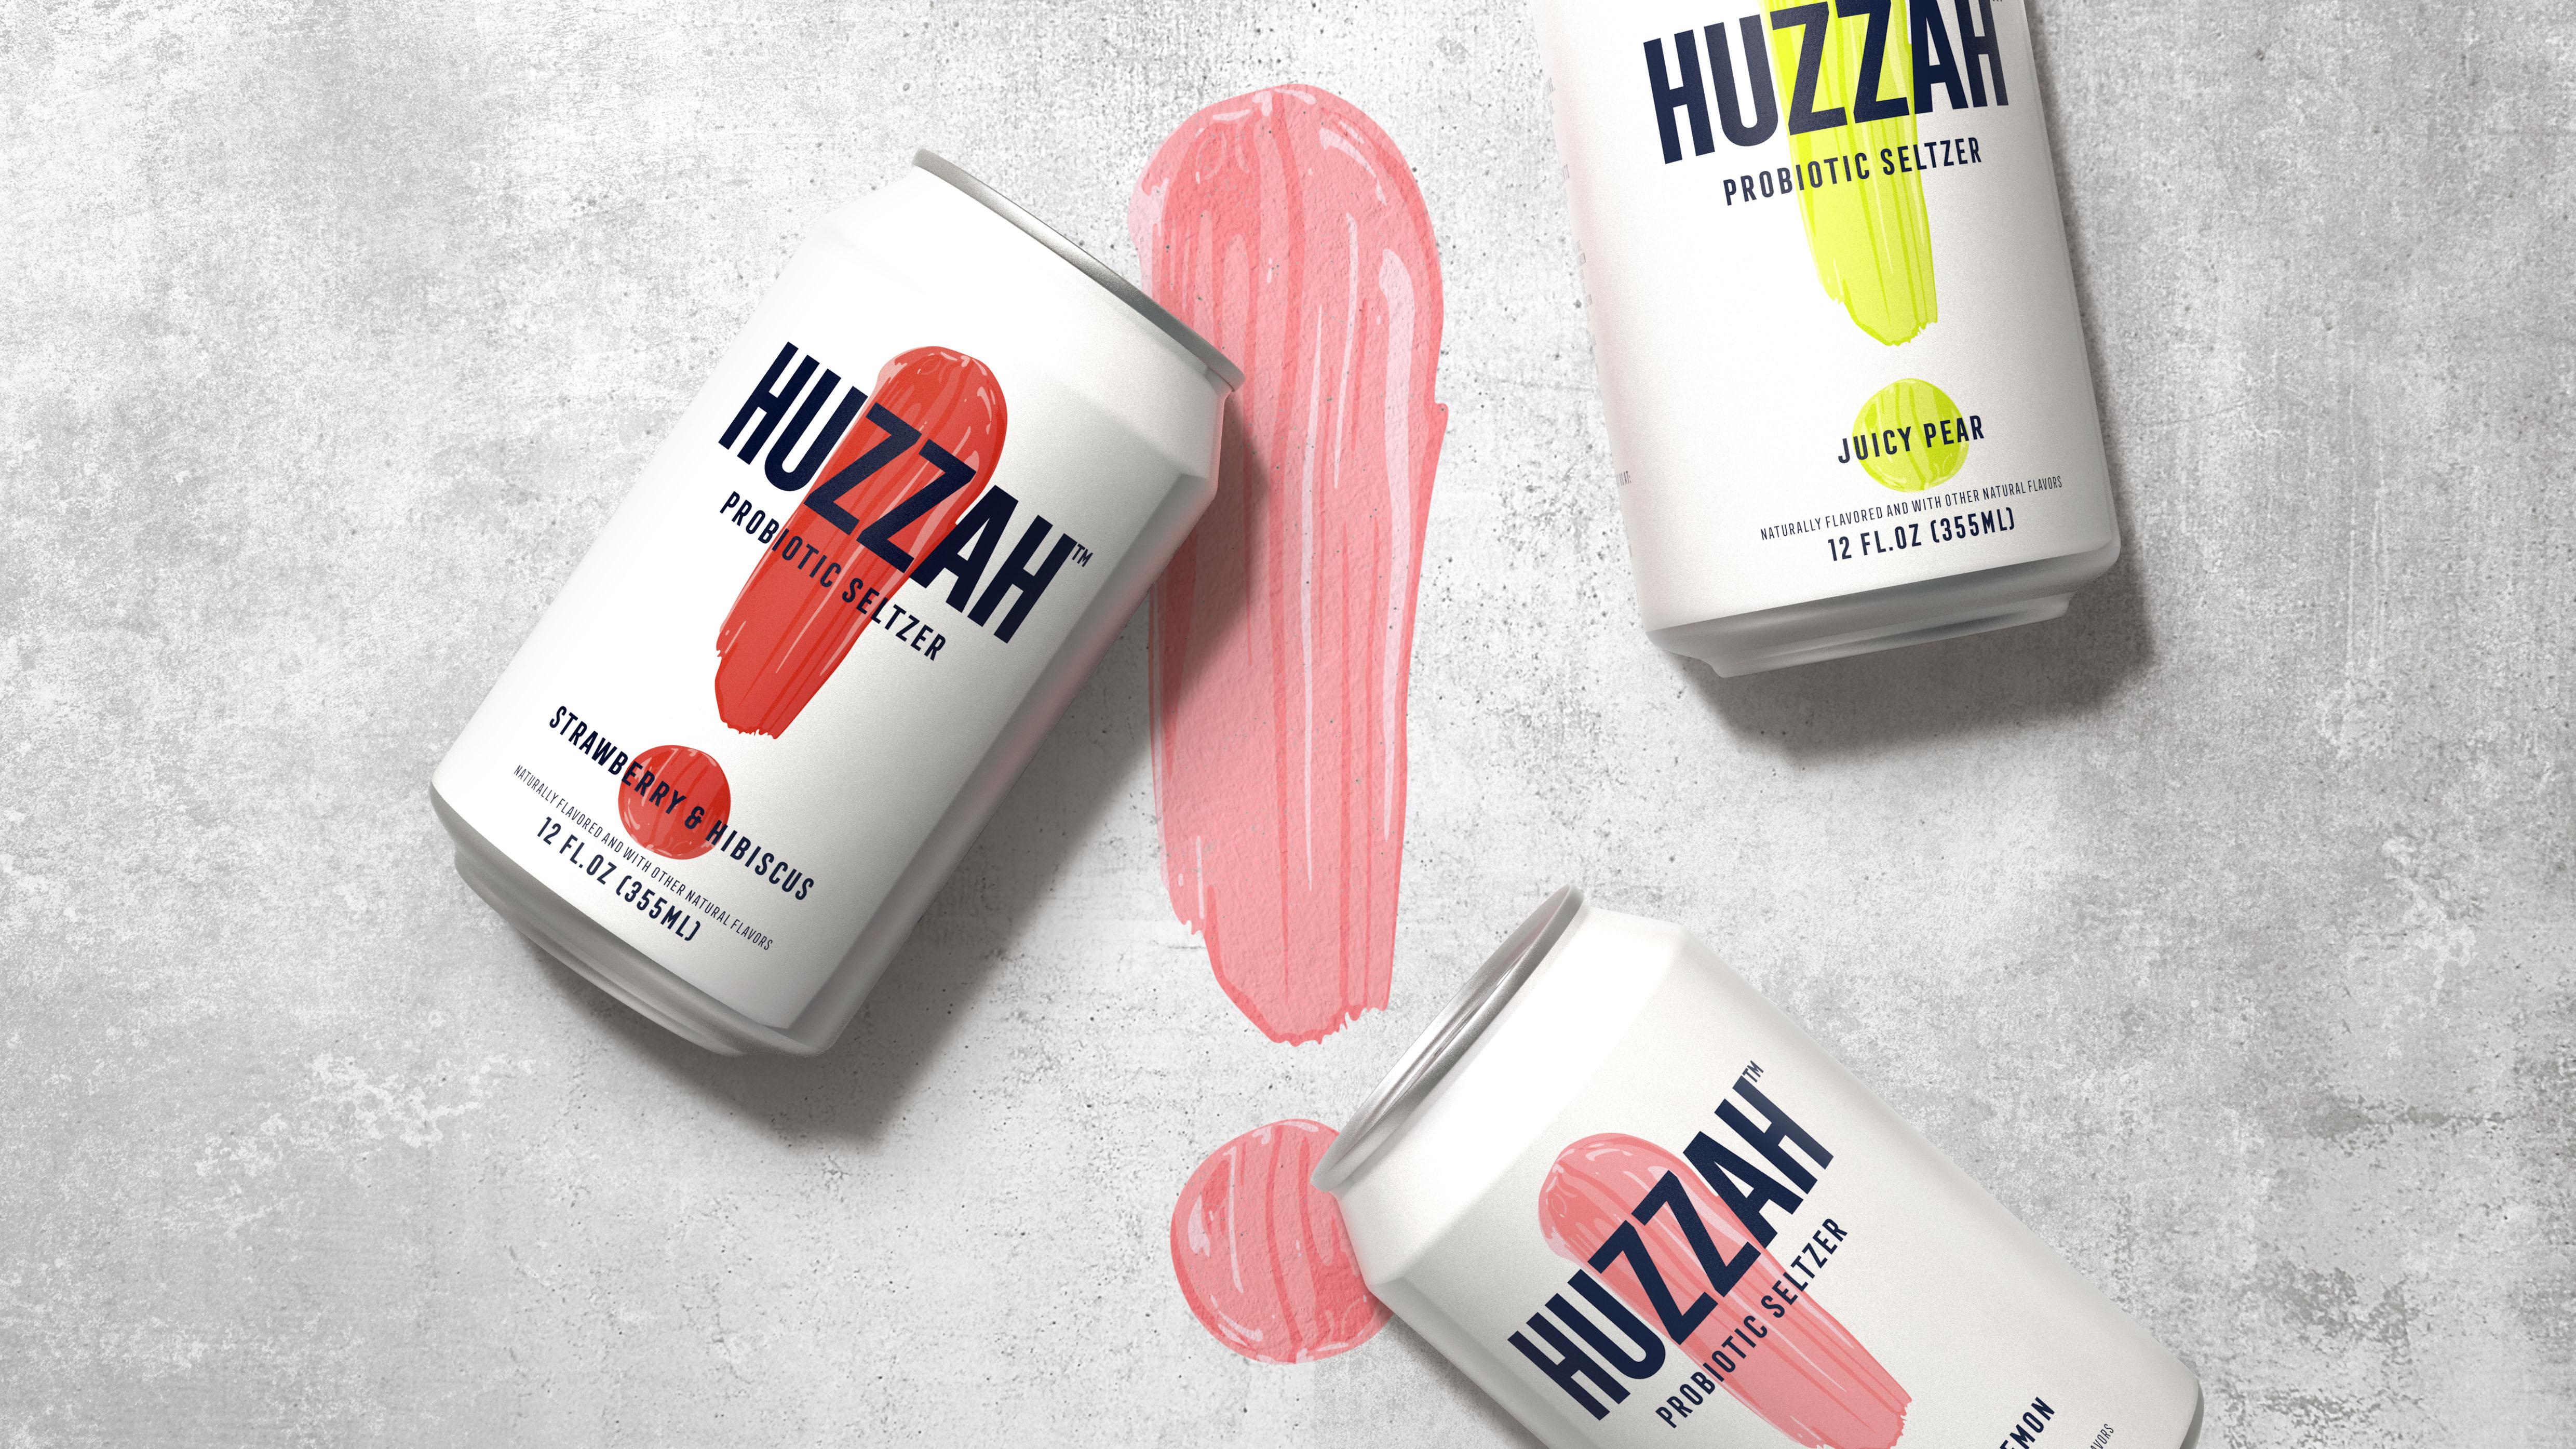 BrandOpus Creates HUZZAH! A New Non-Alcoholic Probiotic Seltzer